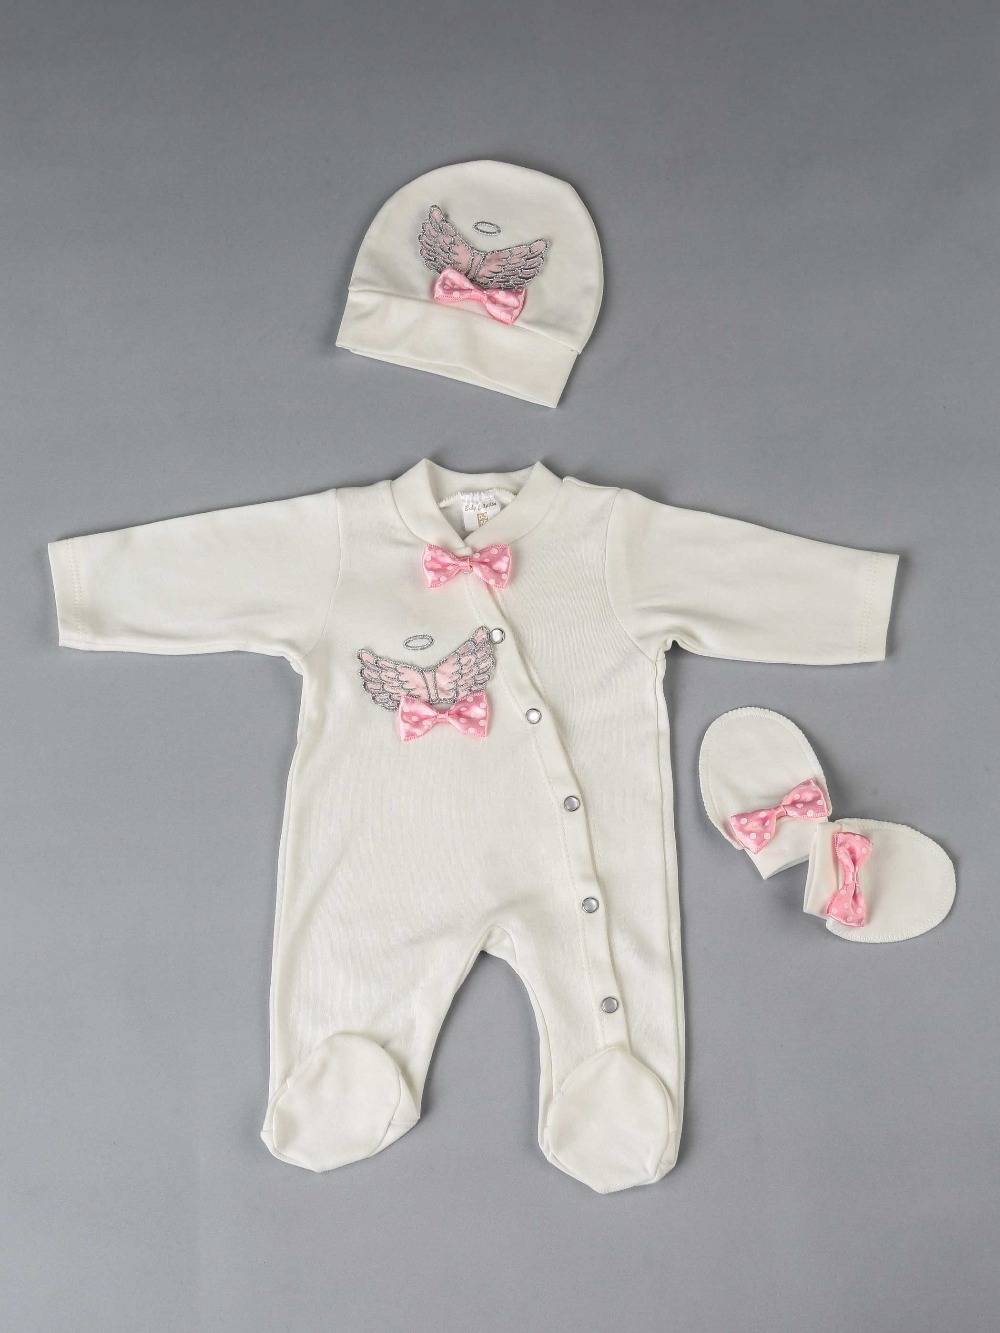 083-584-021 Pembe Melek Kanatlı Kız Bebek 3 lü Tulum Seti (1)